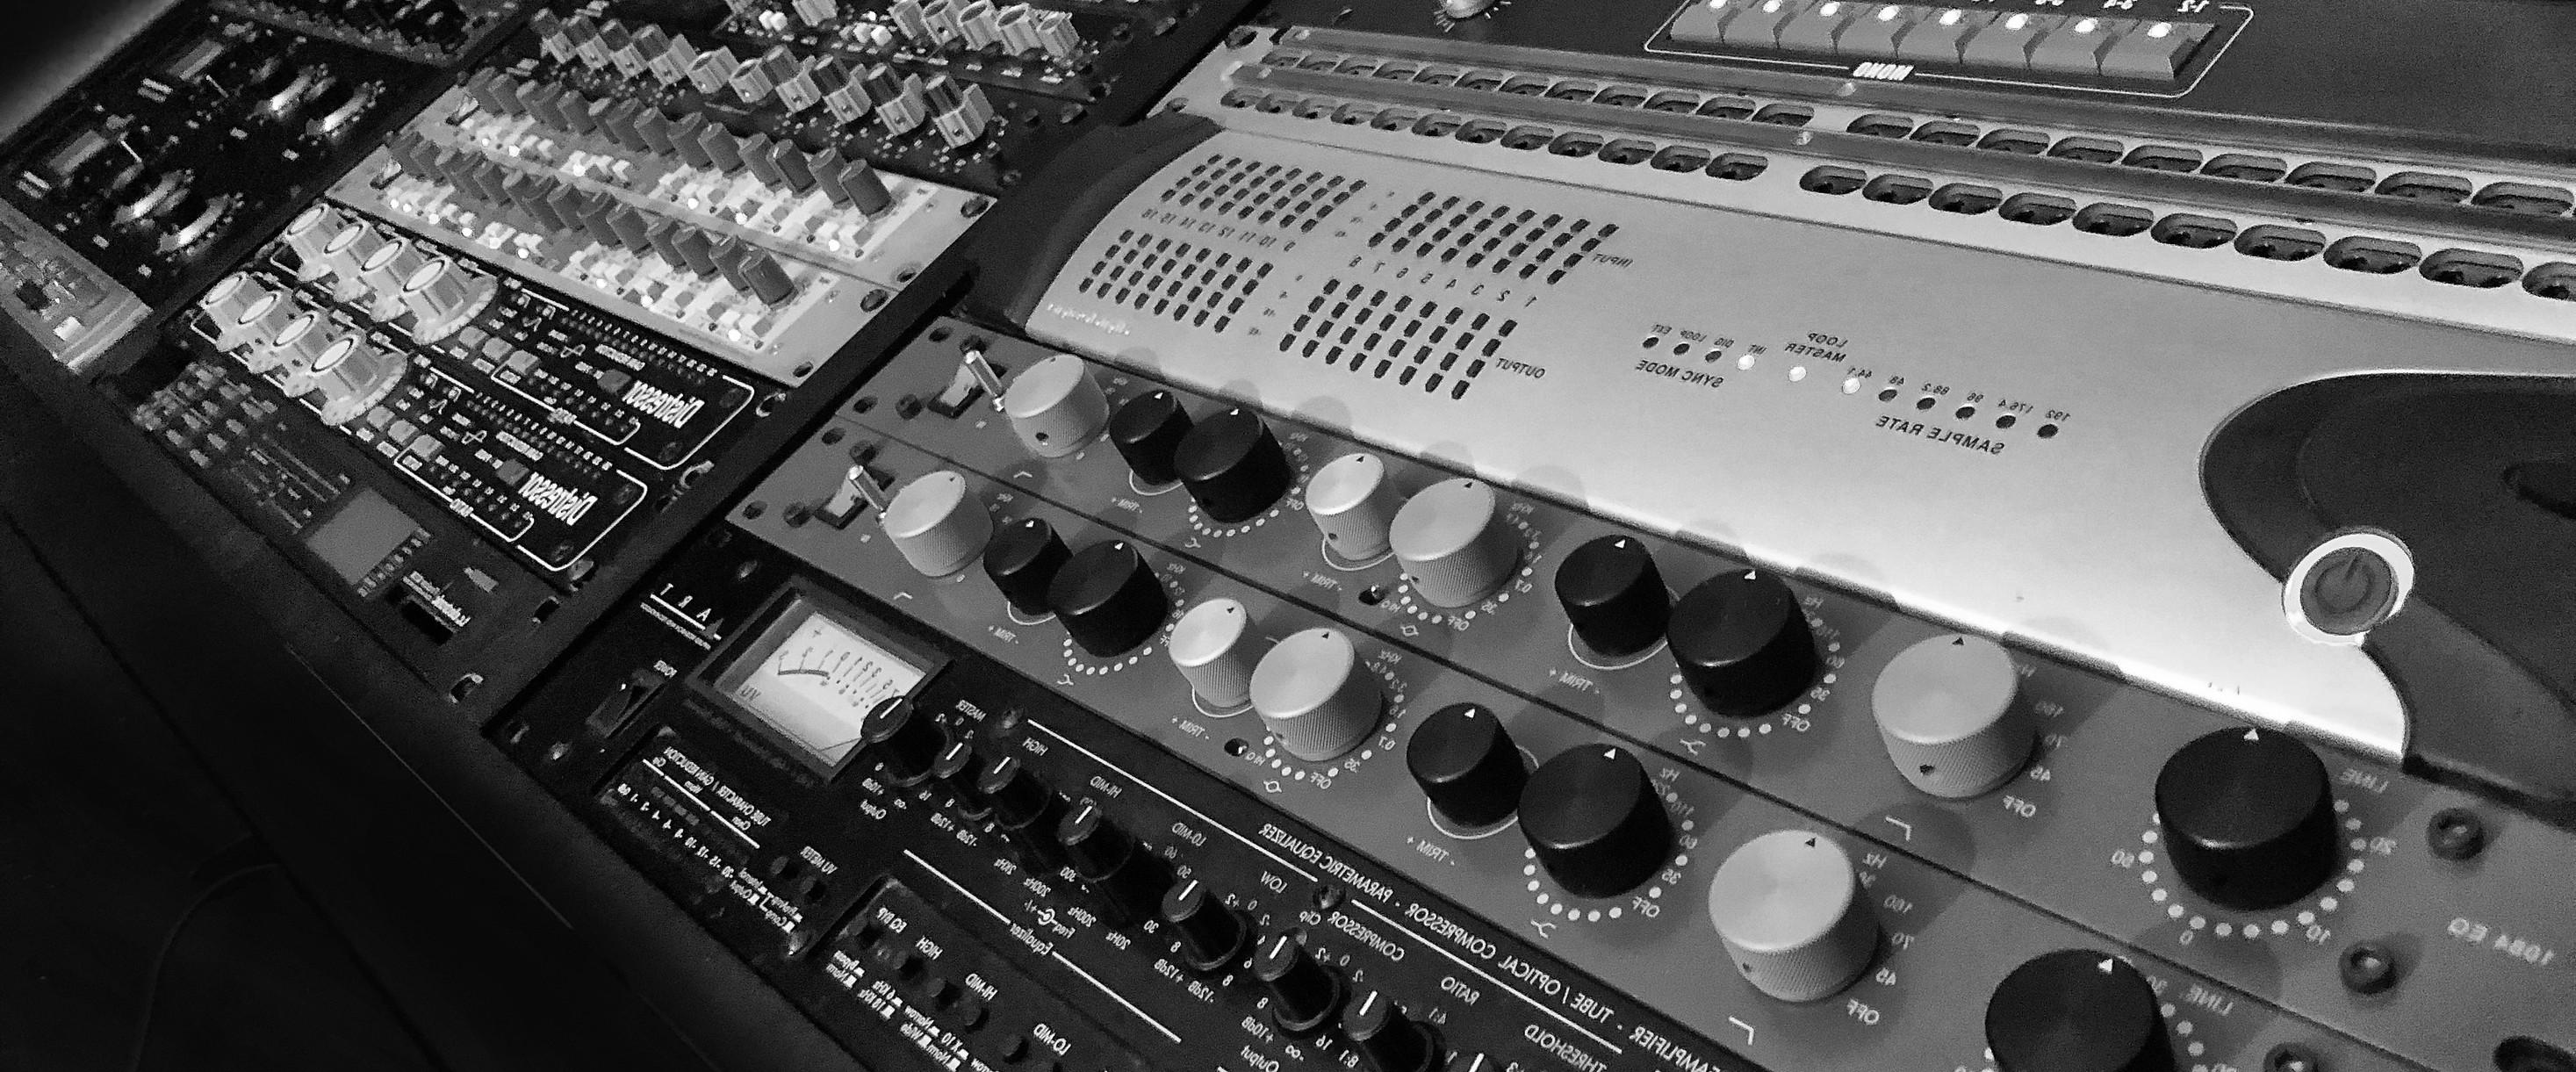 Studio Gear 1_4.jpg